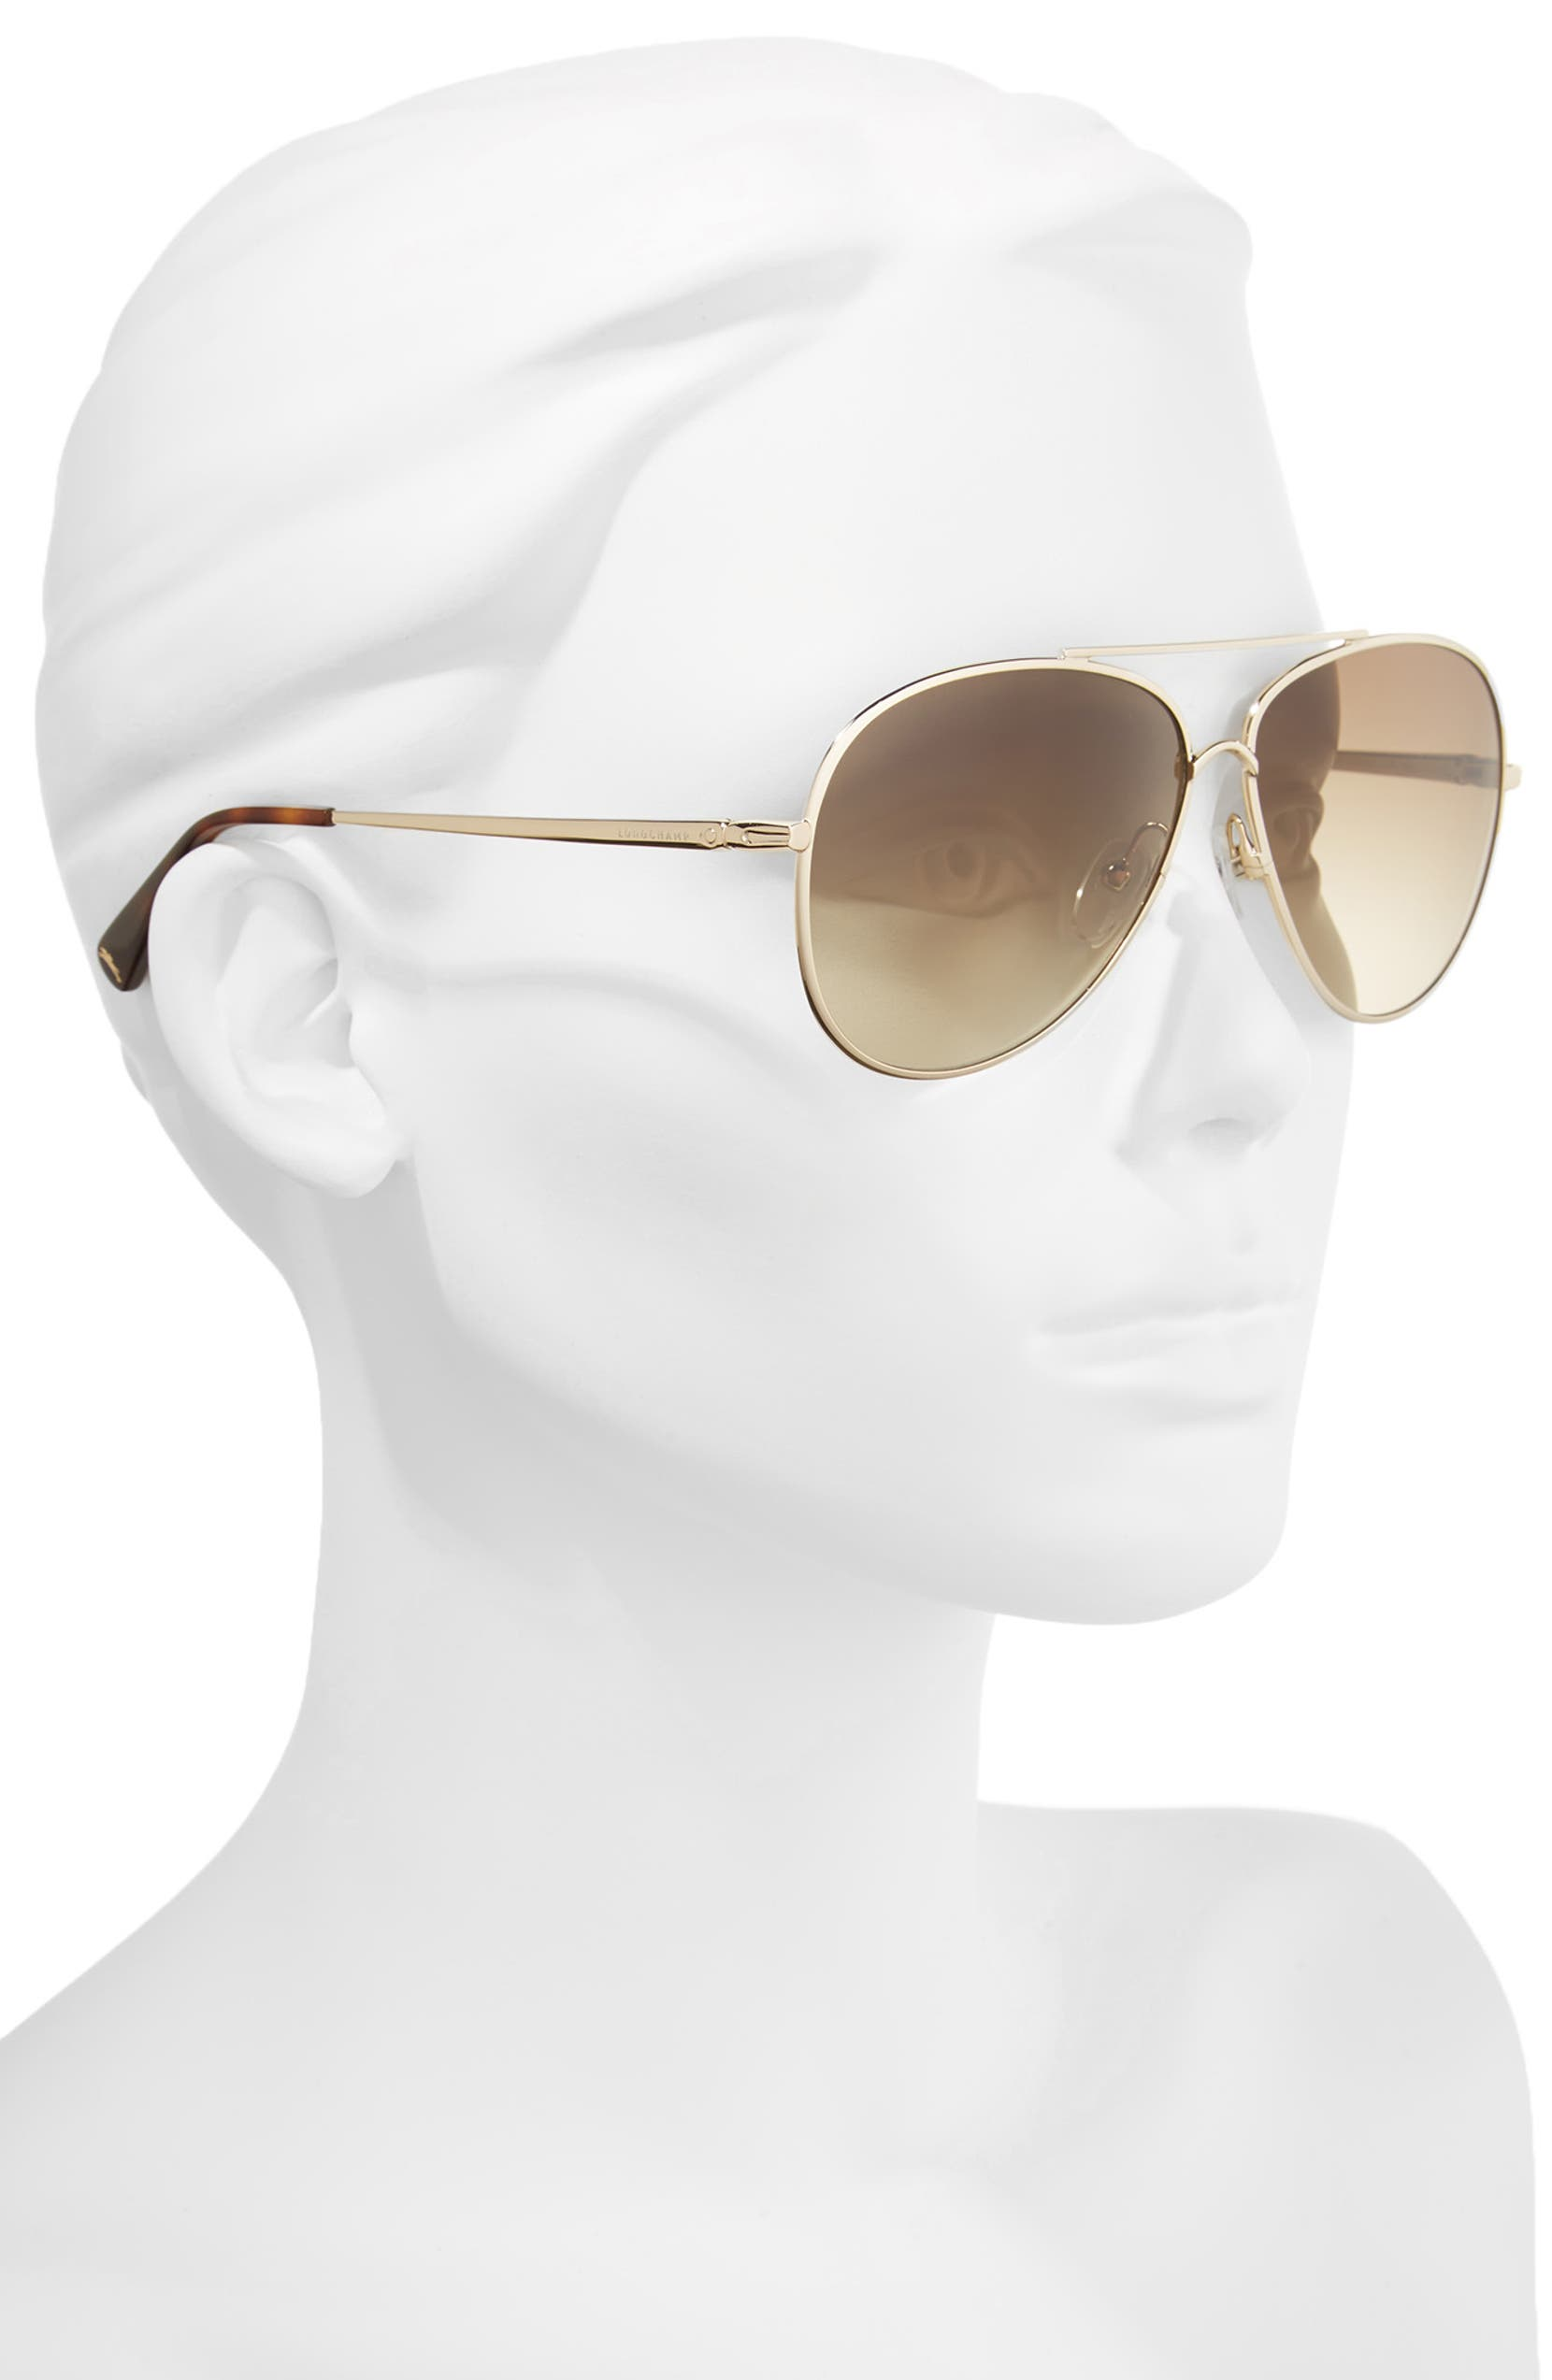 8231c36a13 Longchamp 61mm Gradient Lens Aviator Sunglasses